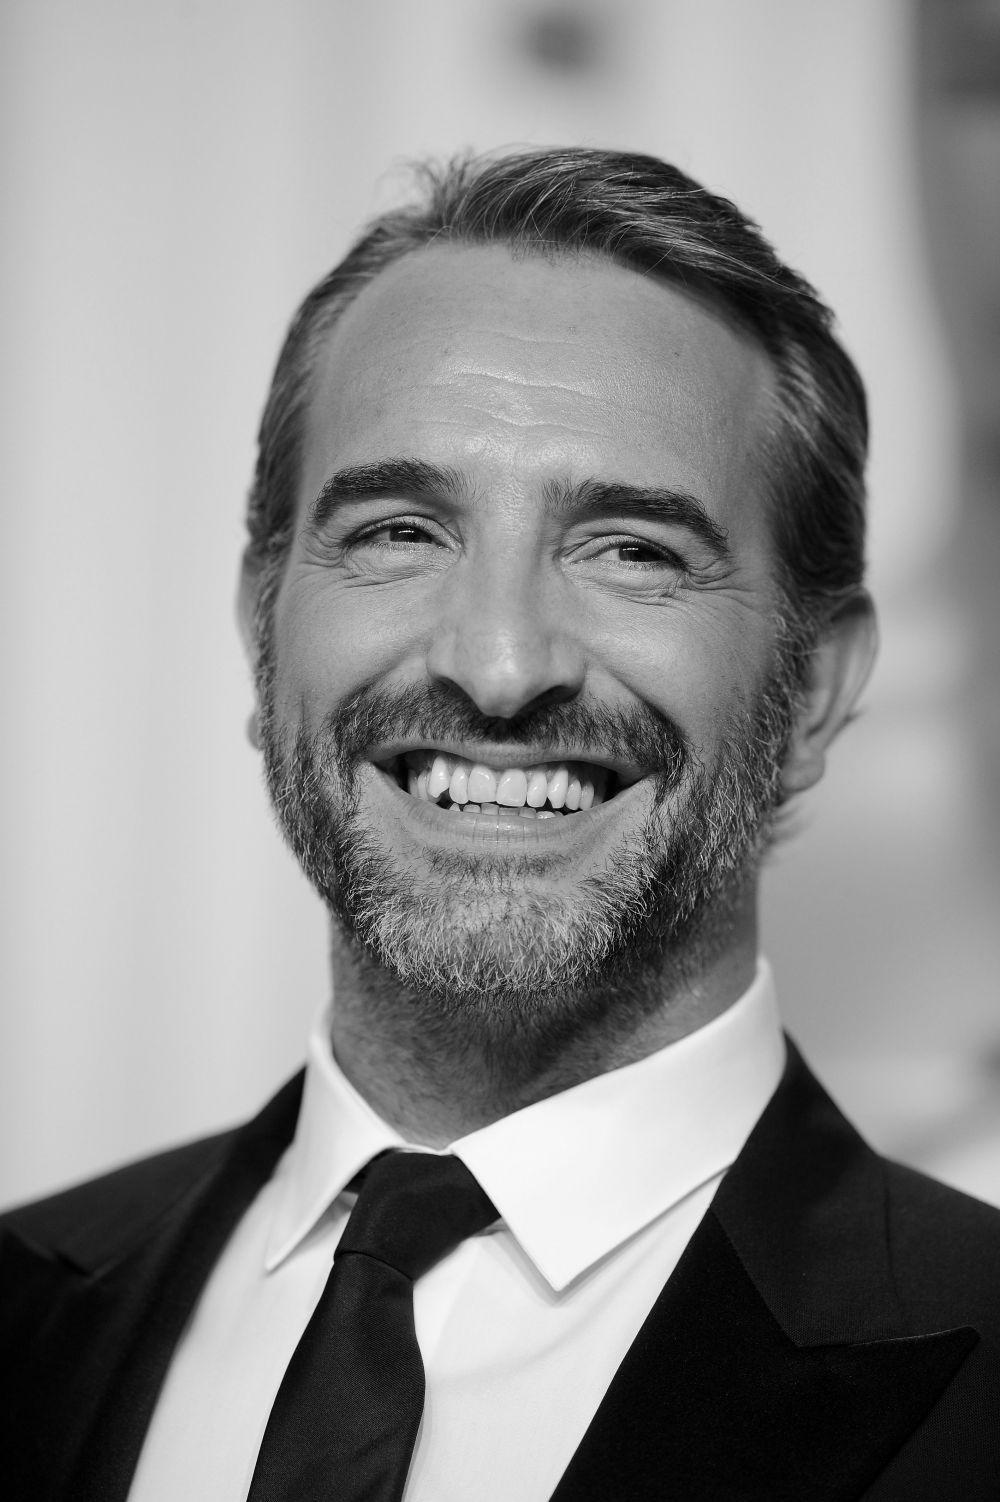 Jean dujardin jean dujardin for Dujardin patrick